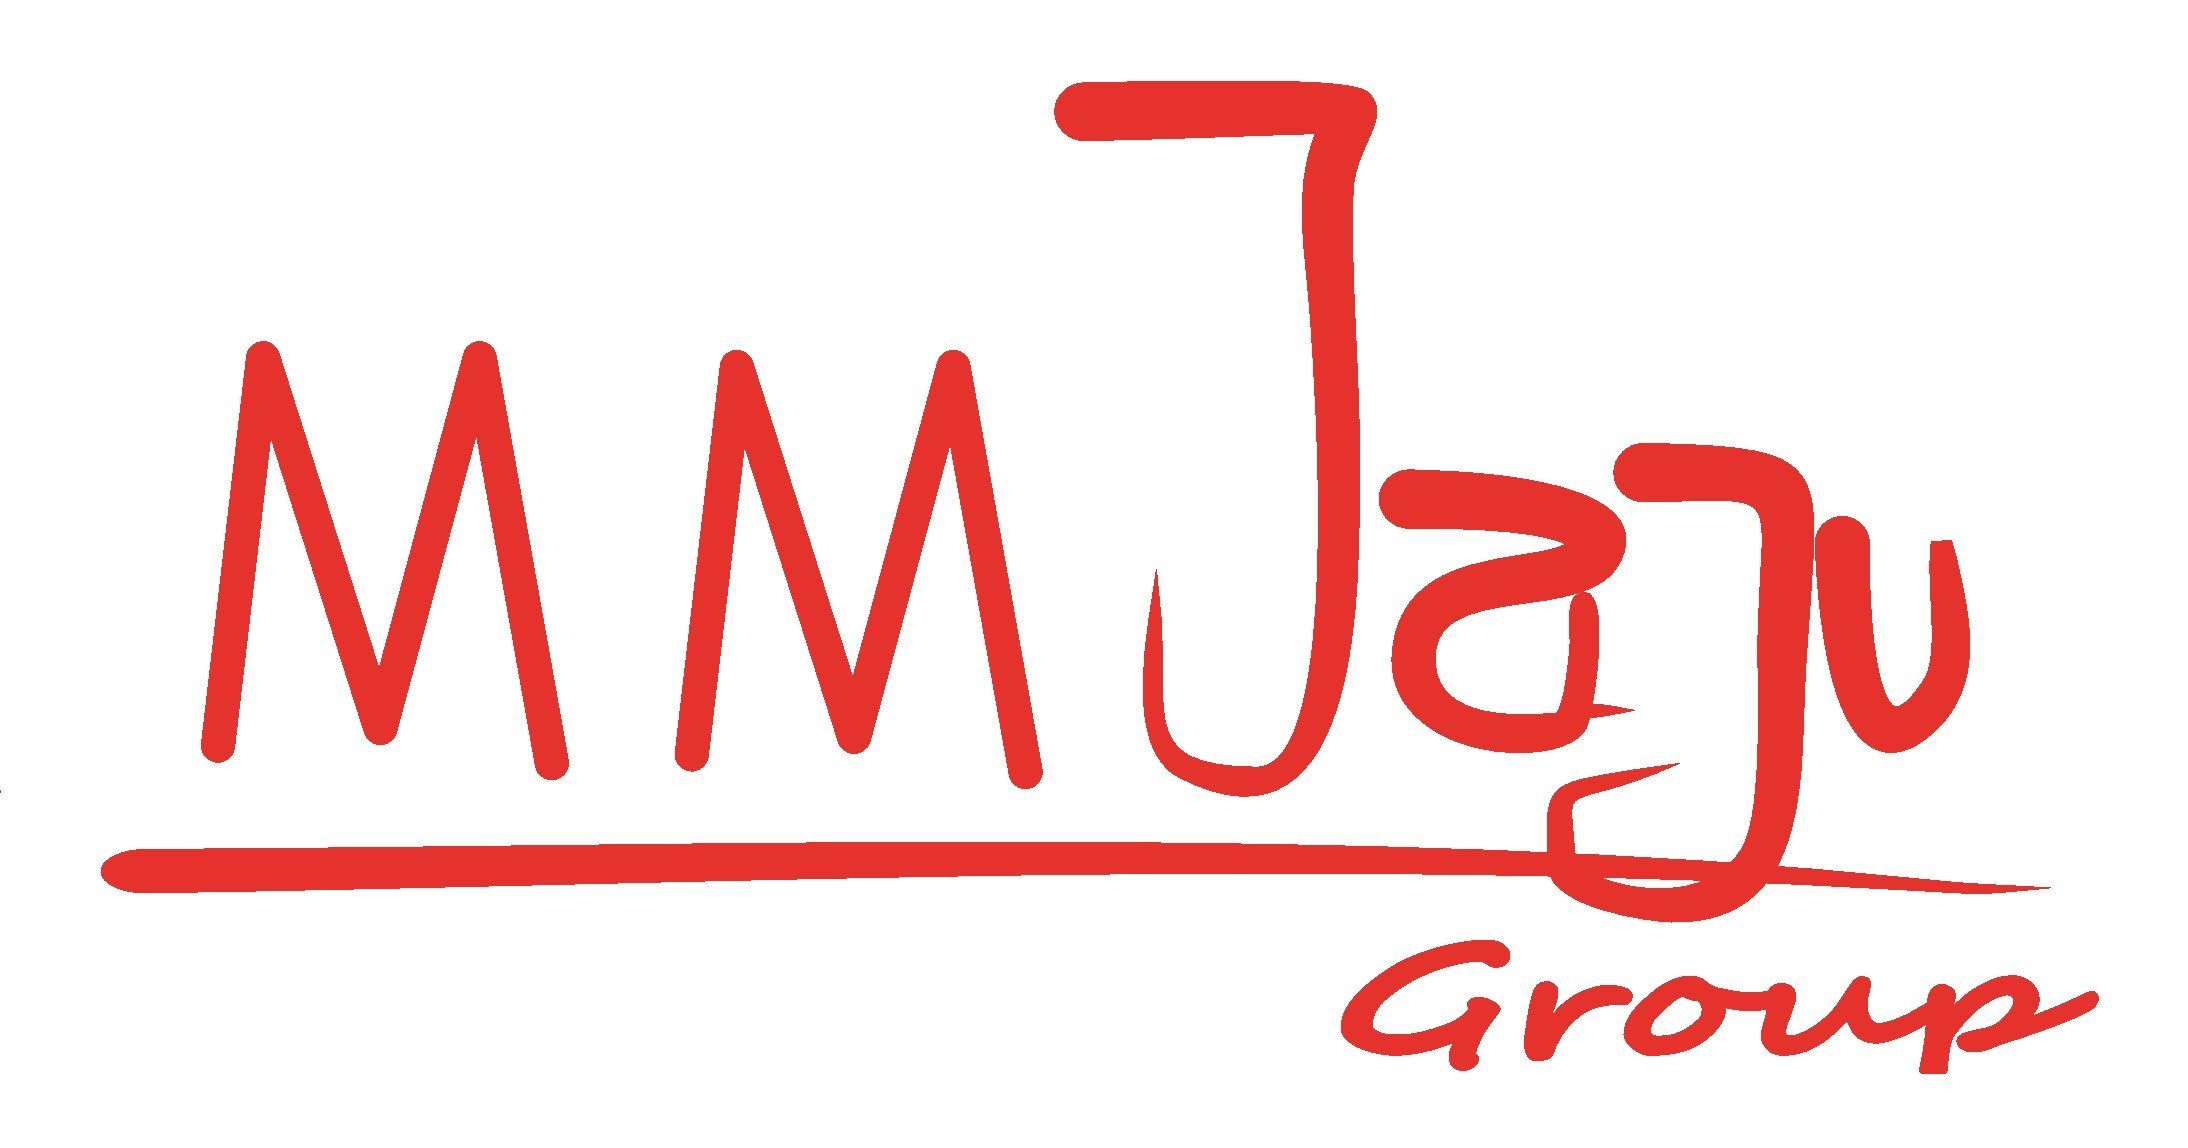 MM Jaju Group